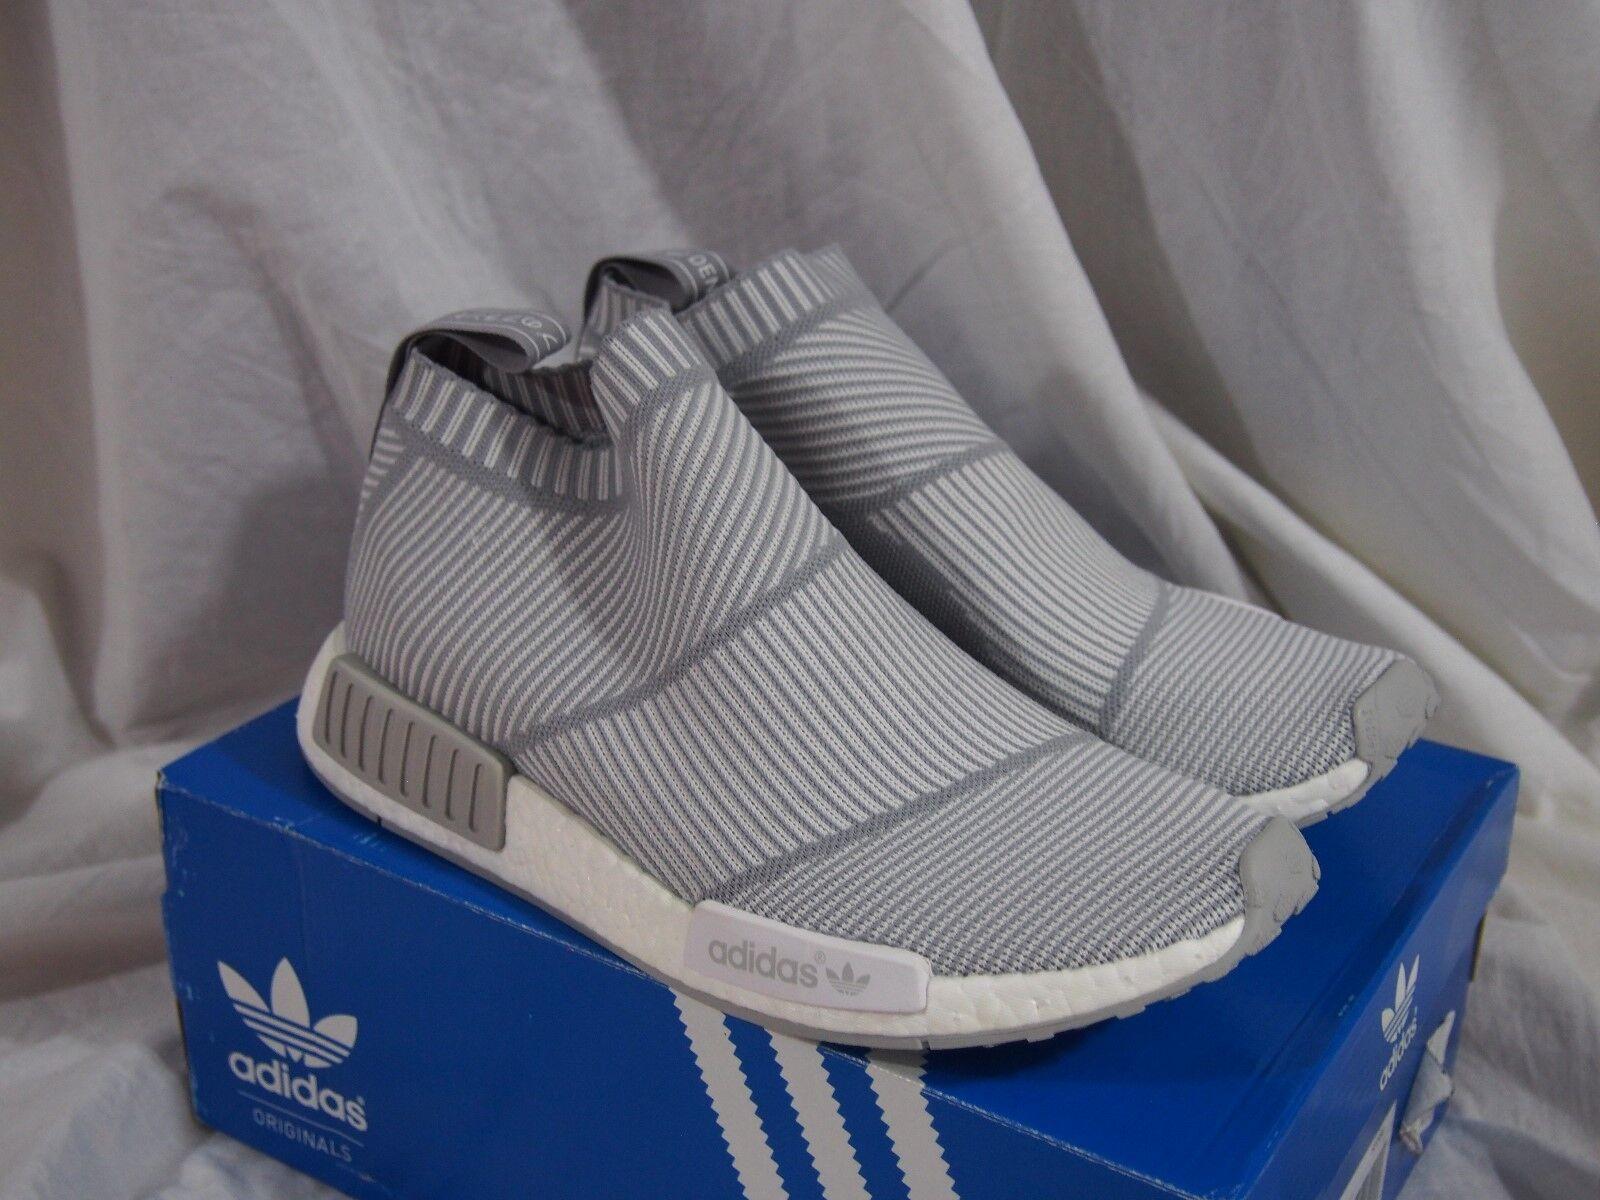 Adidas NMD CS1 City Sock Primeknit S32191 size 10.5 US